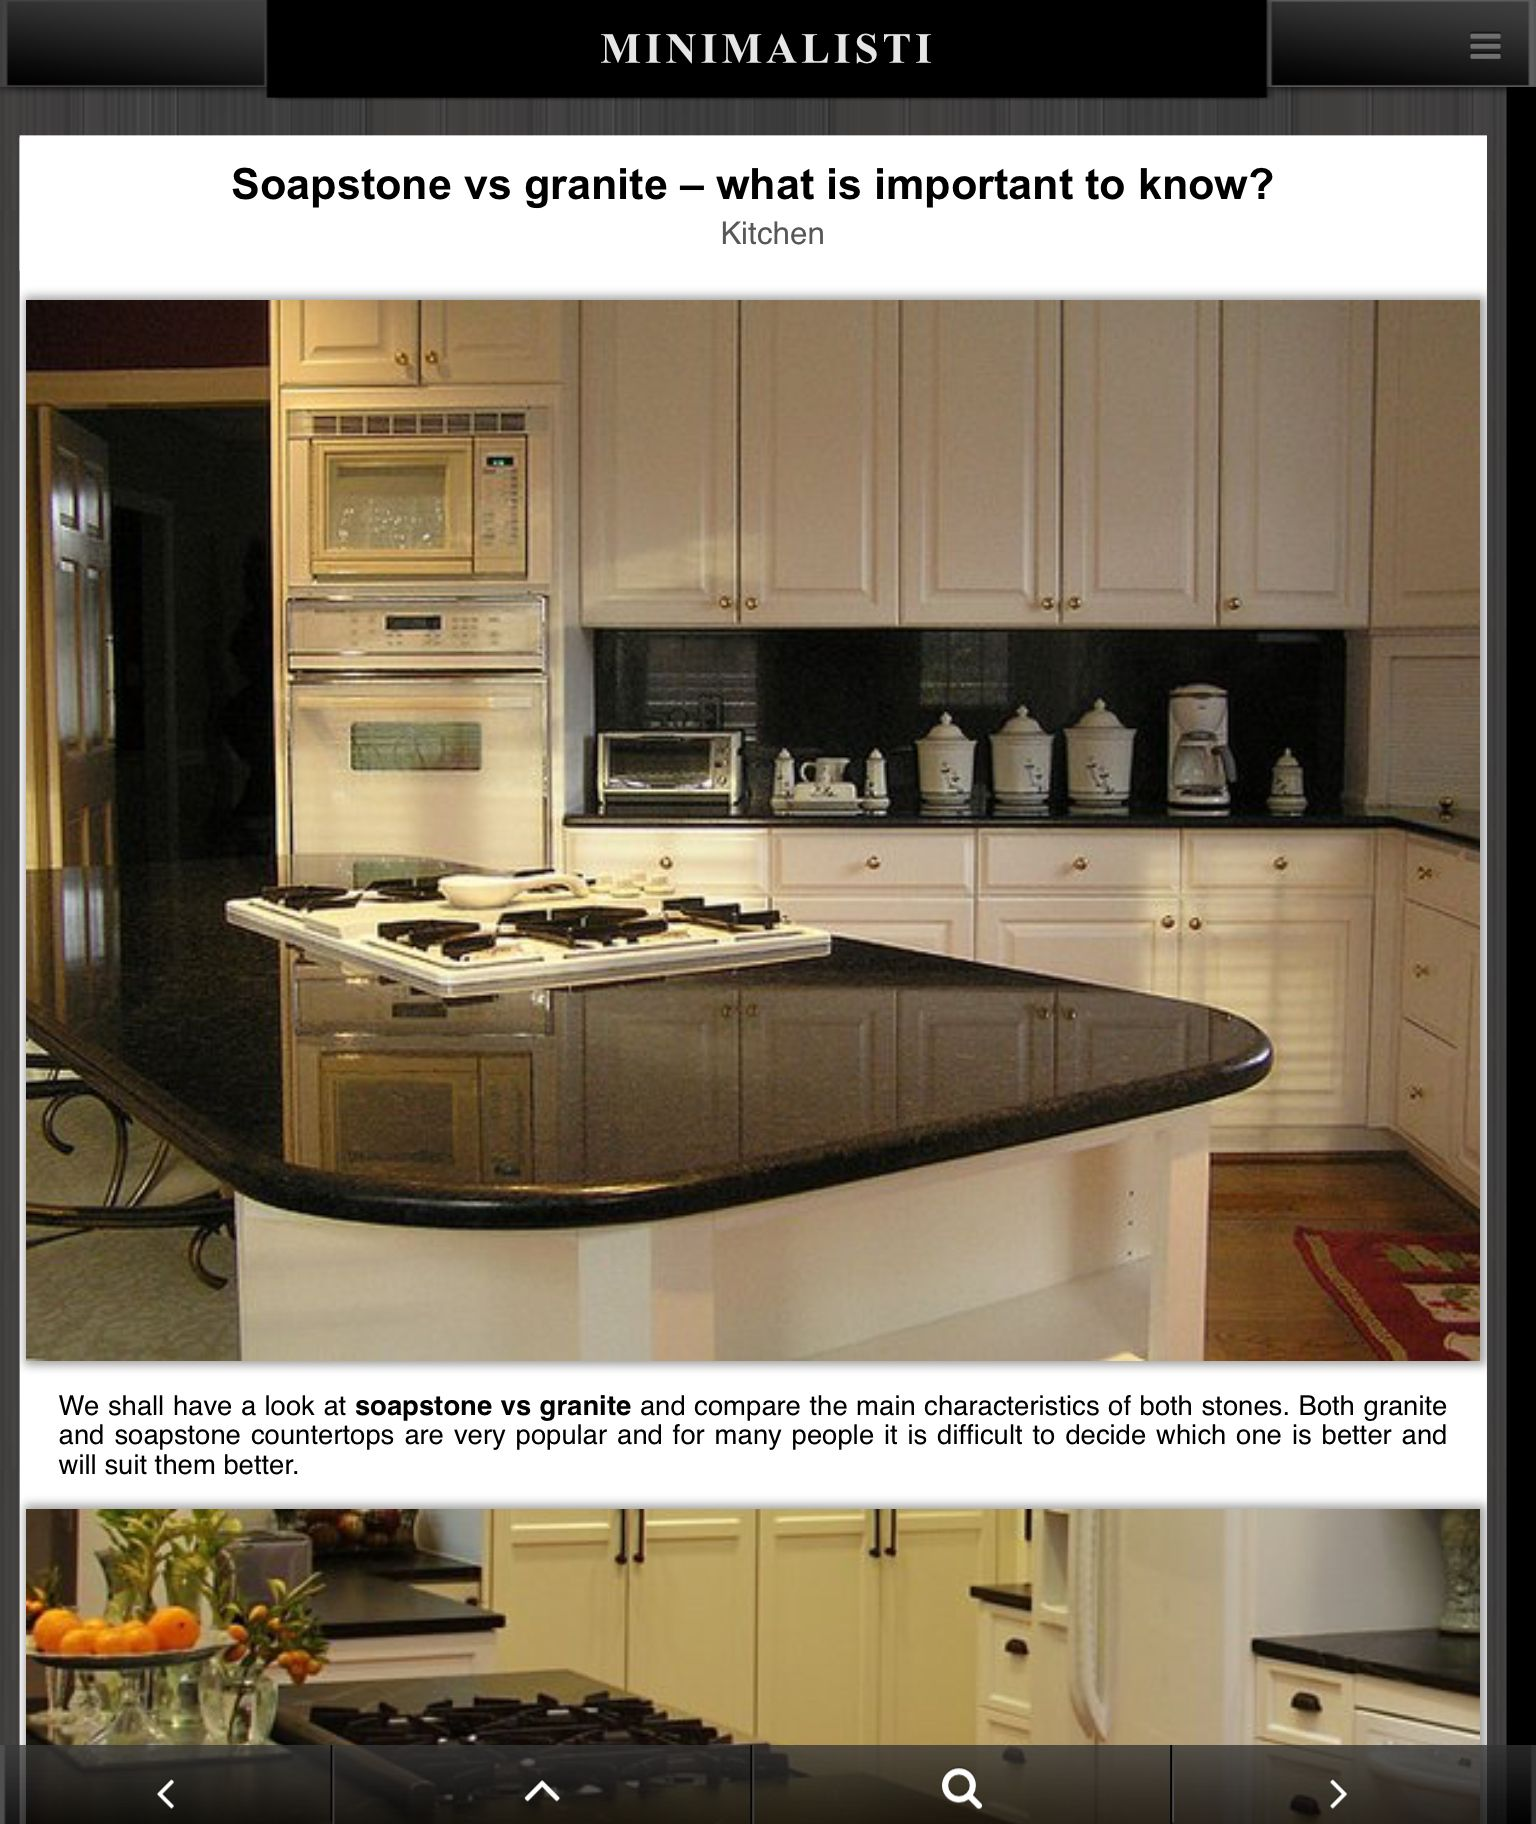 https://www.minimalisti.com/kitchen/03/soapstone-vs-granite-review Soapstone Countertops Cabi Html on